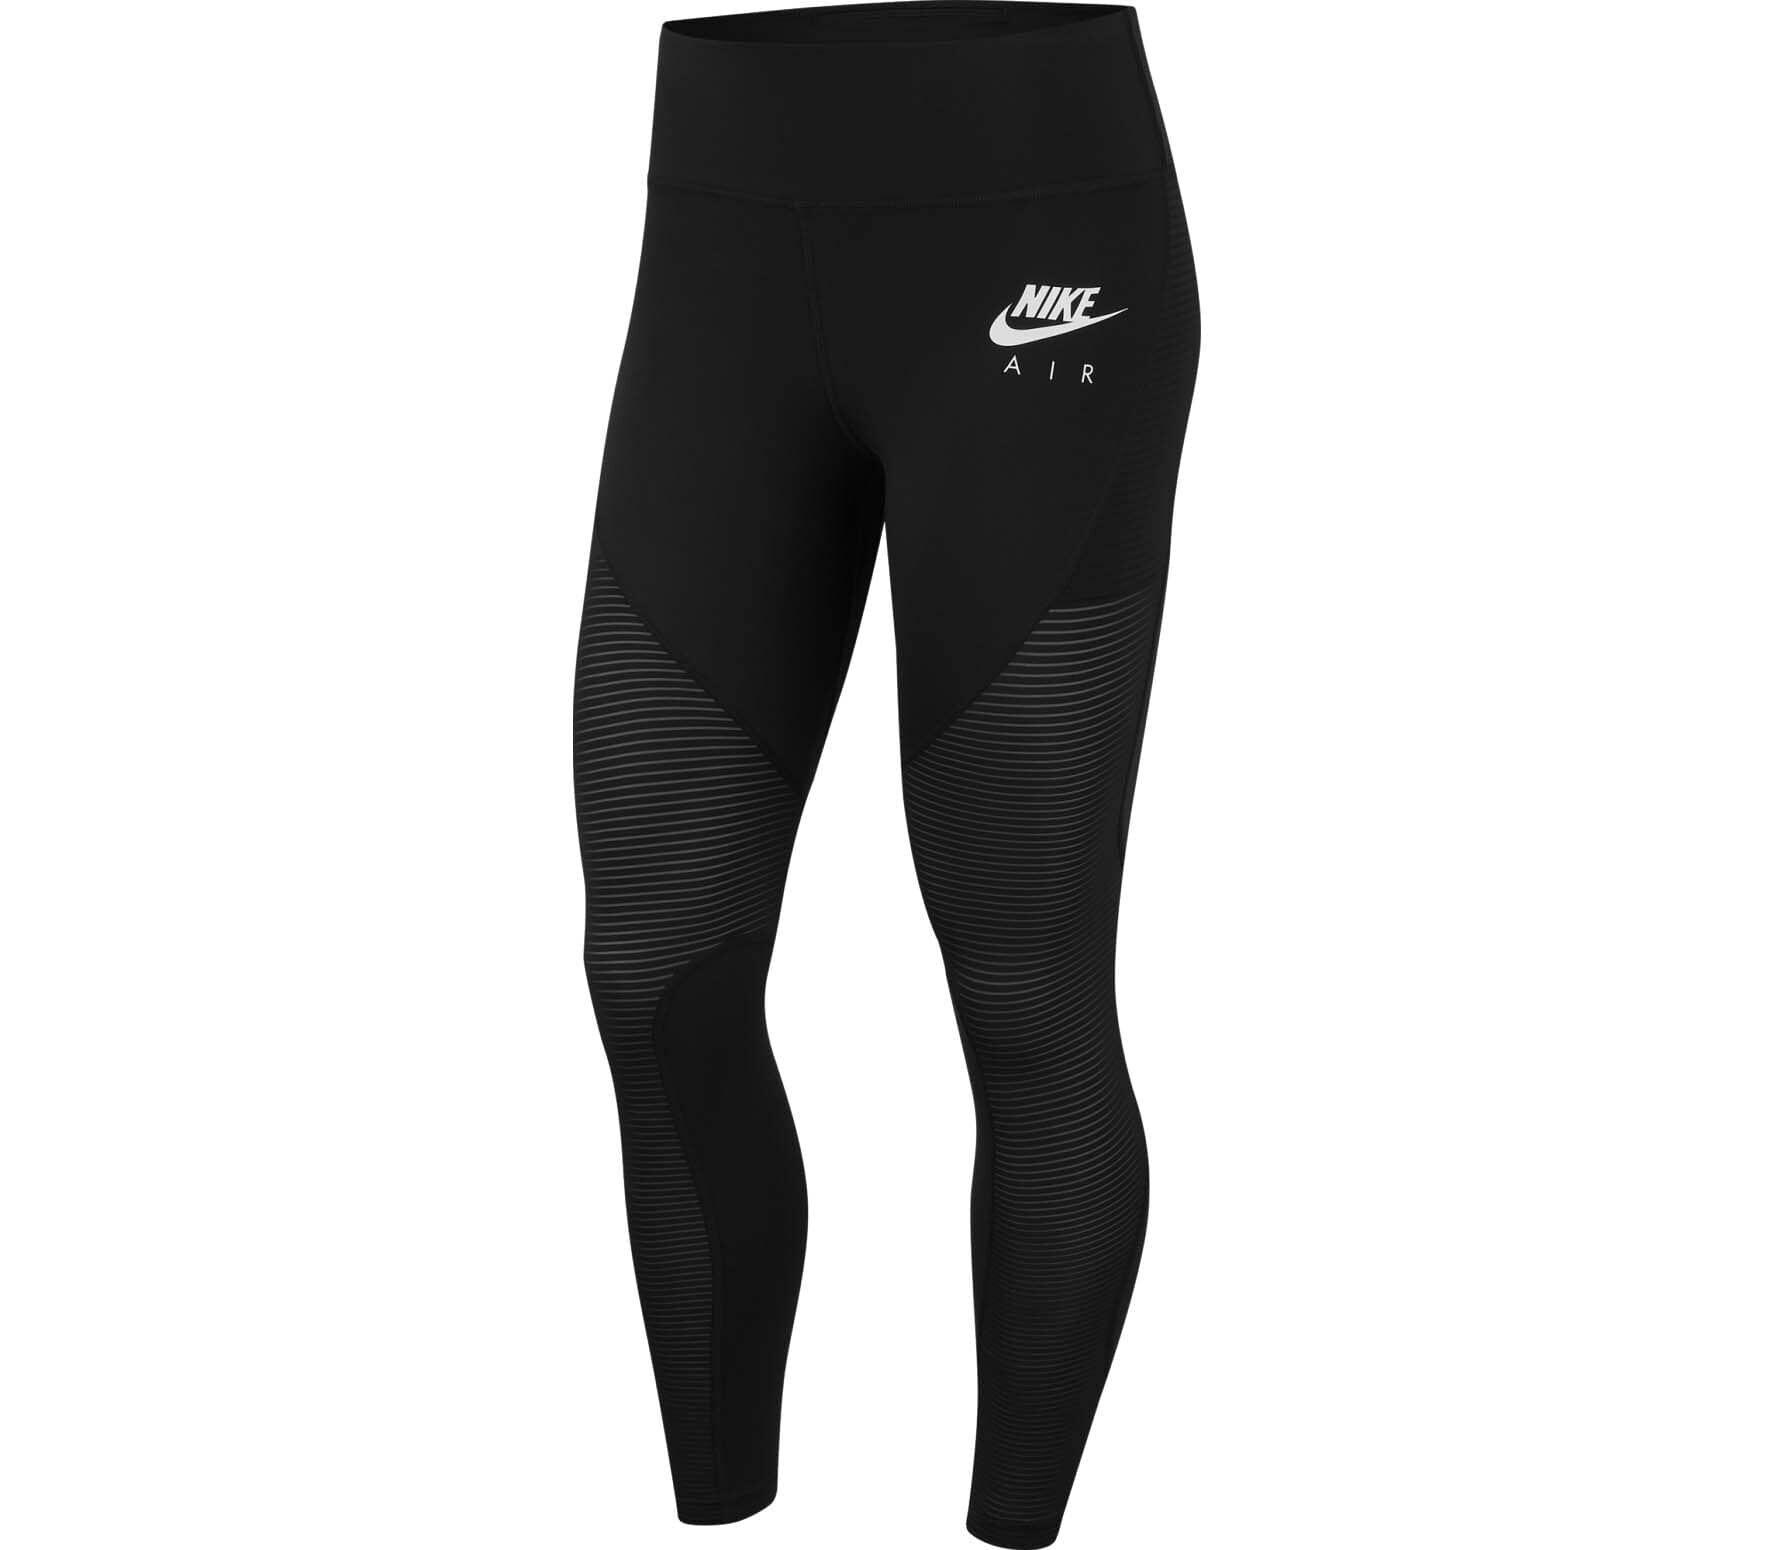 Nike - Air 7/8 Dam löparbyxor (svart) - M